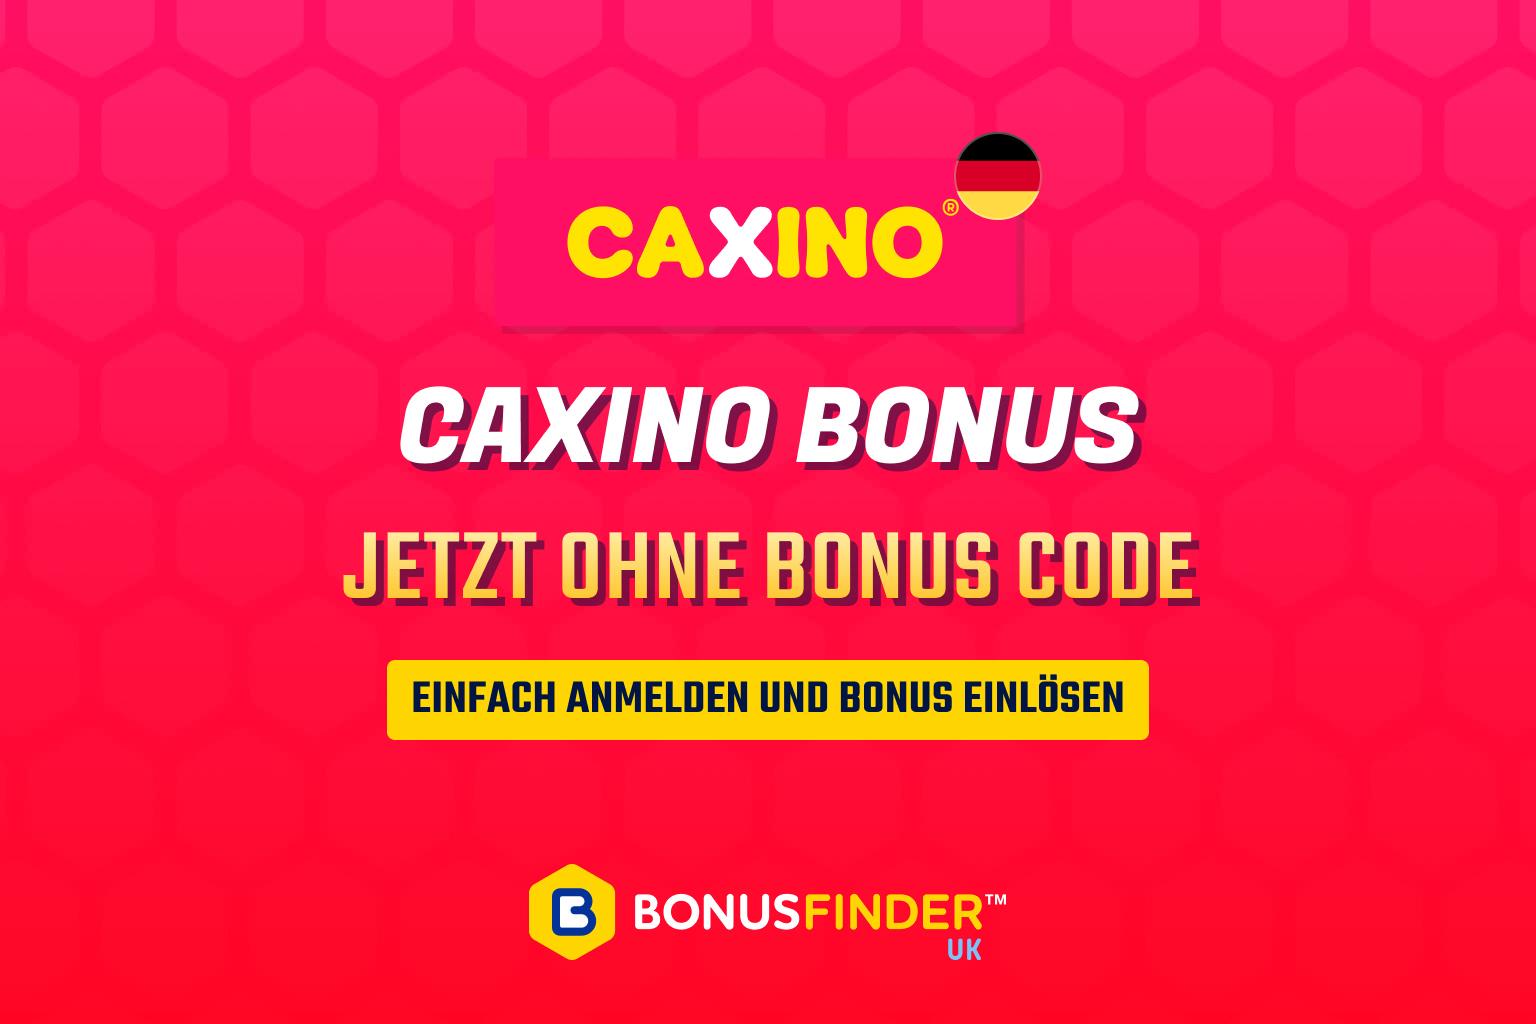 caxino bonus code